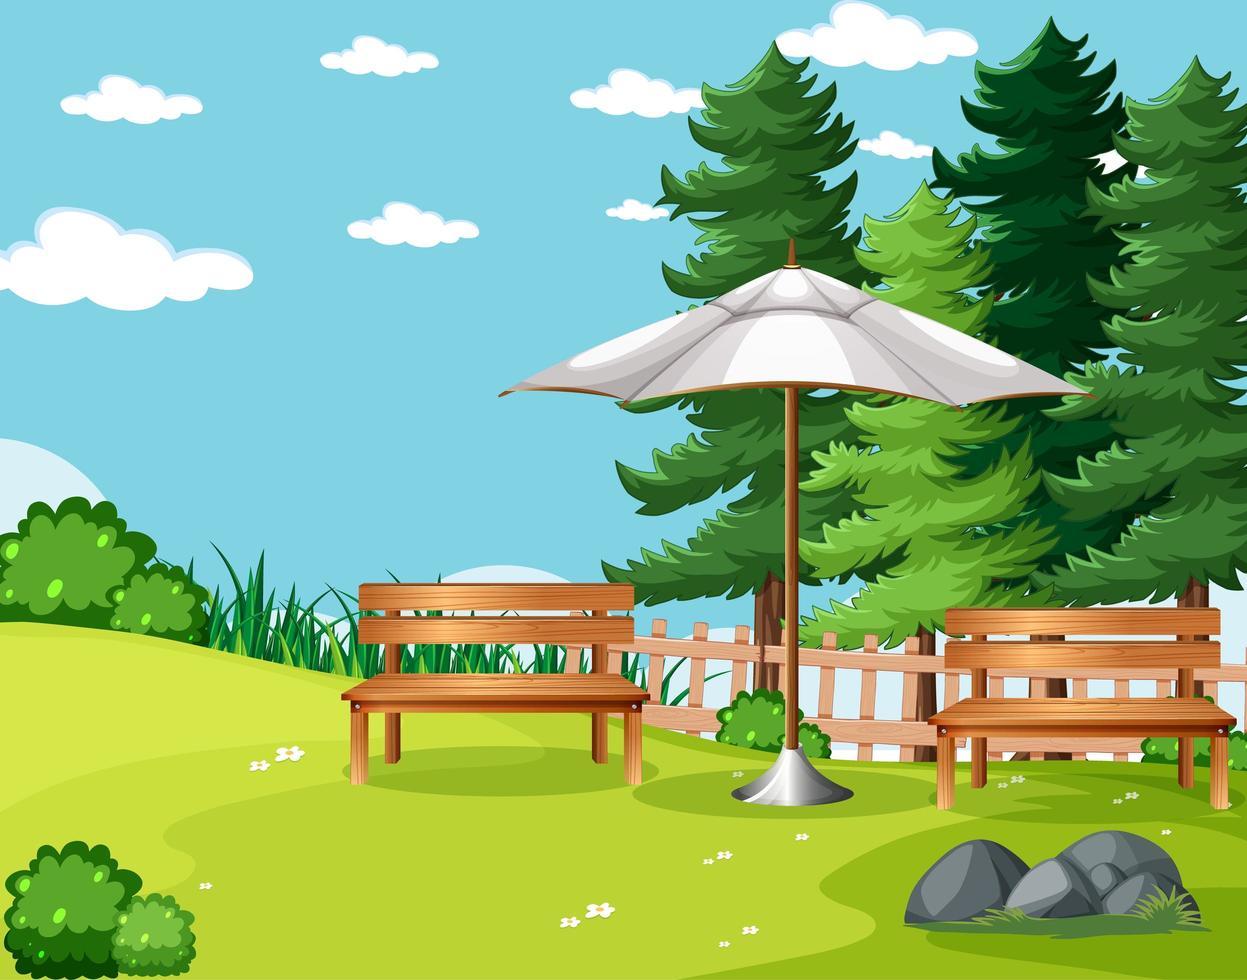 natuurpark picknick lege scène vector